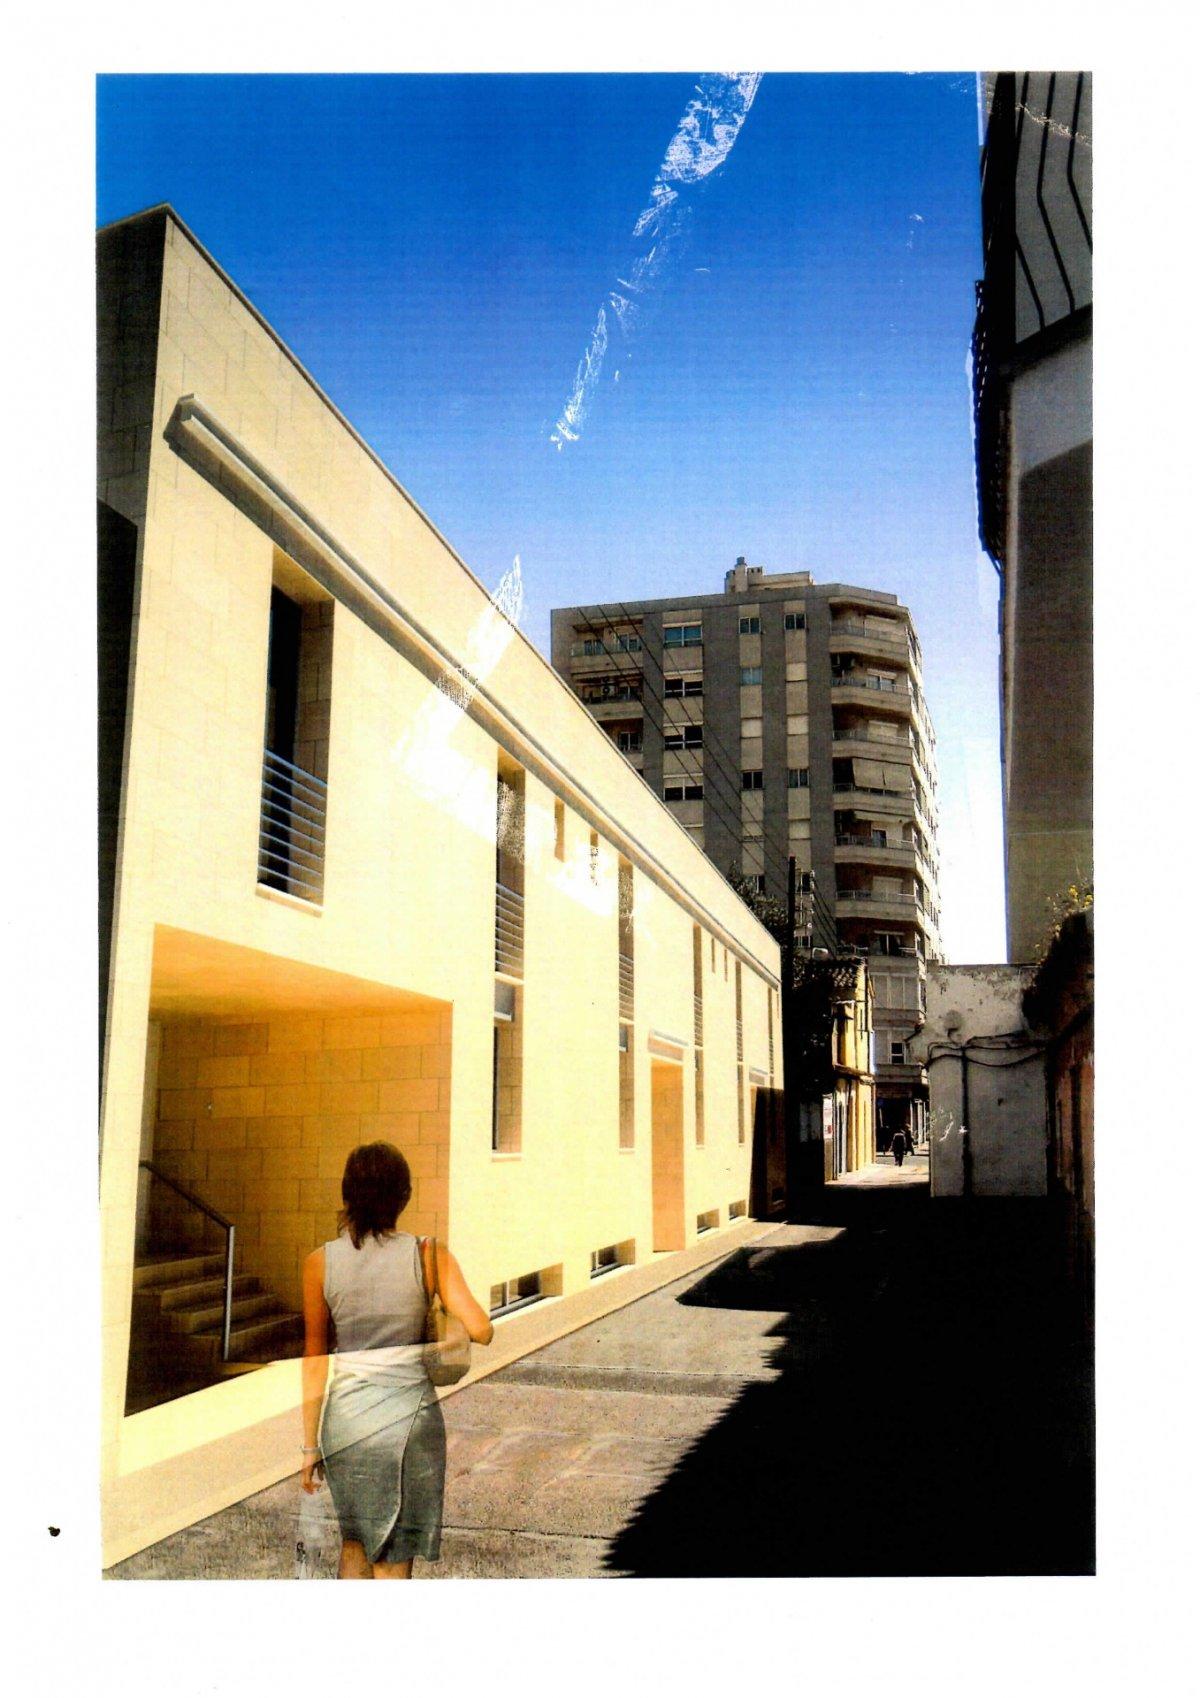 Area edificabile urbana  Palma de mallorca ,els hostalets. En venta terreno urbano con proyecto de 5 adosados en zona aragó